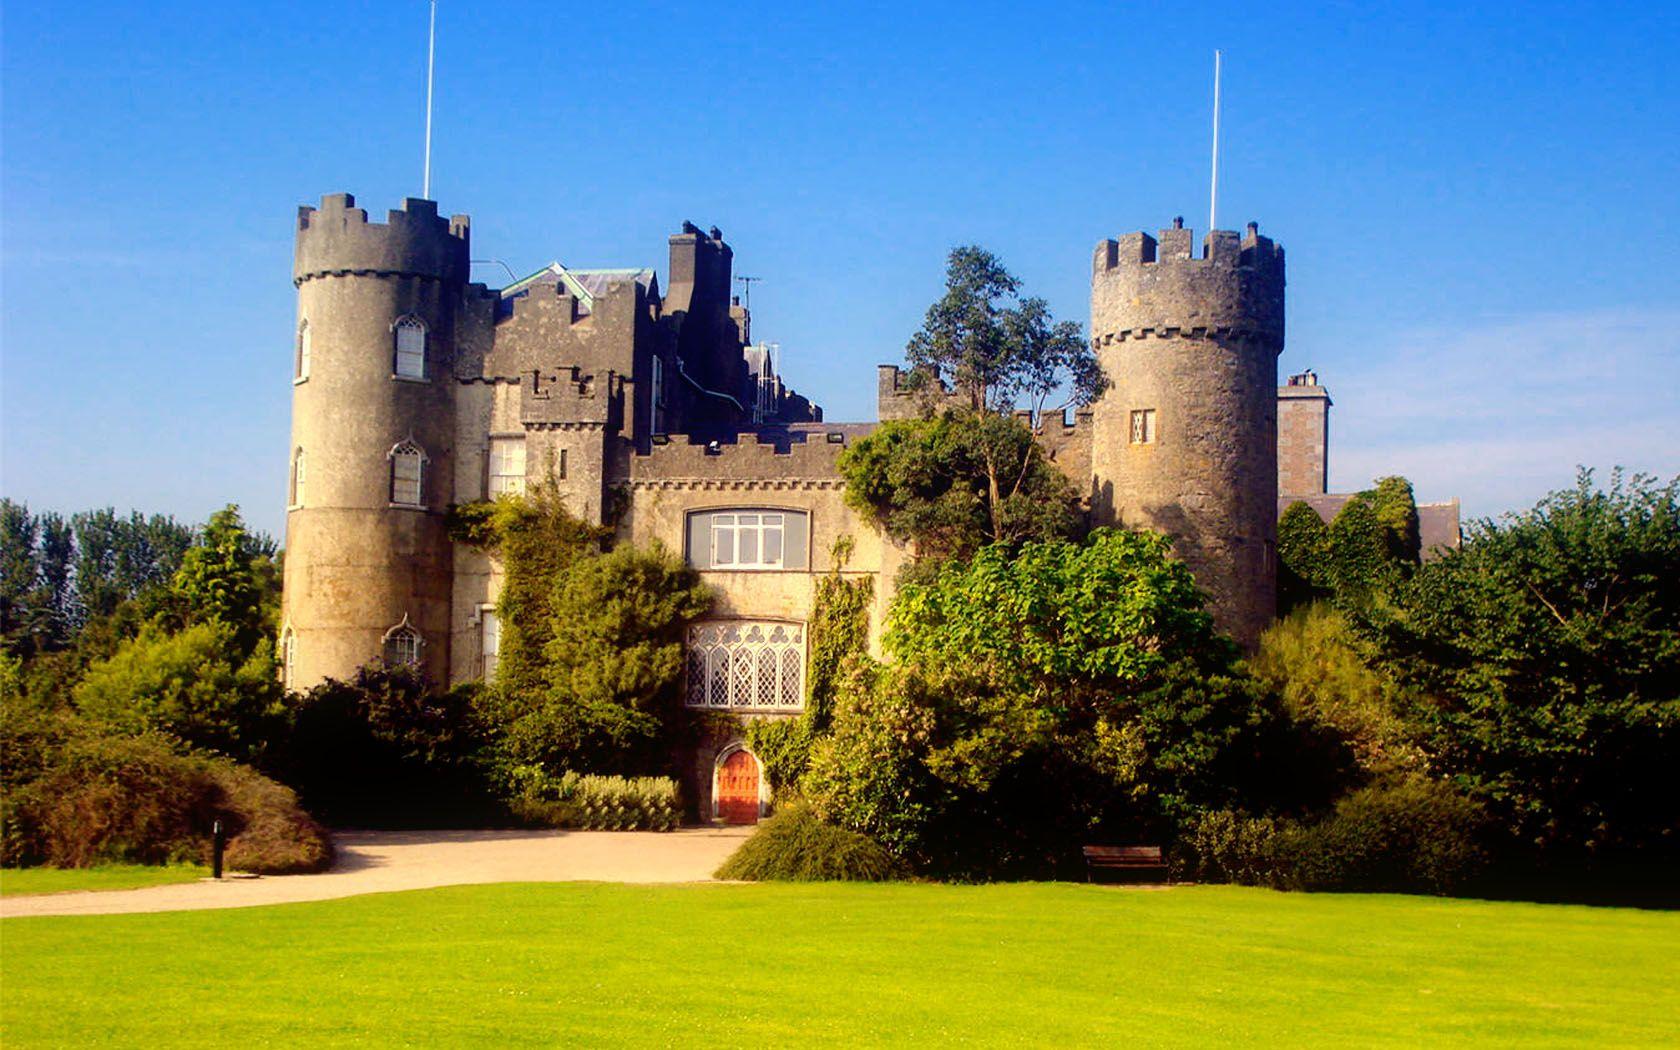 Irish Castles Wallpaper for PC - WallpaperSafari Ireland Castle Wallpaper